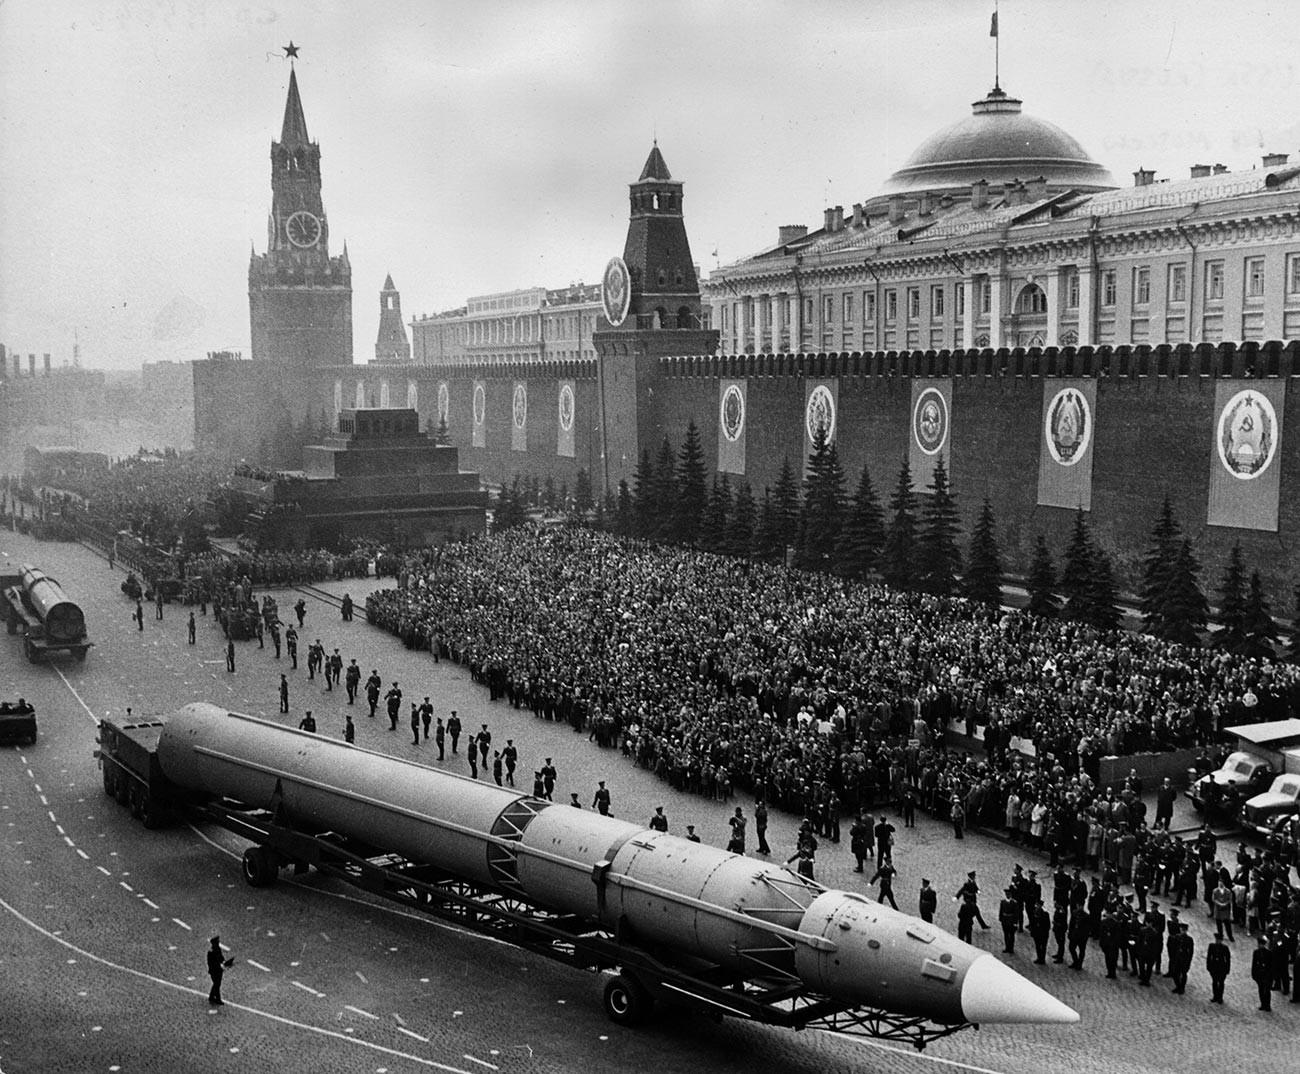 Ruska interkontinentalna raketa na vojnoj paradi na Crvenom trgu u Moskvi povodom 20. godišnjice okončanja rata u Europi.